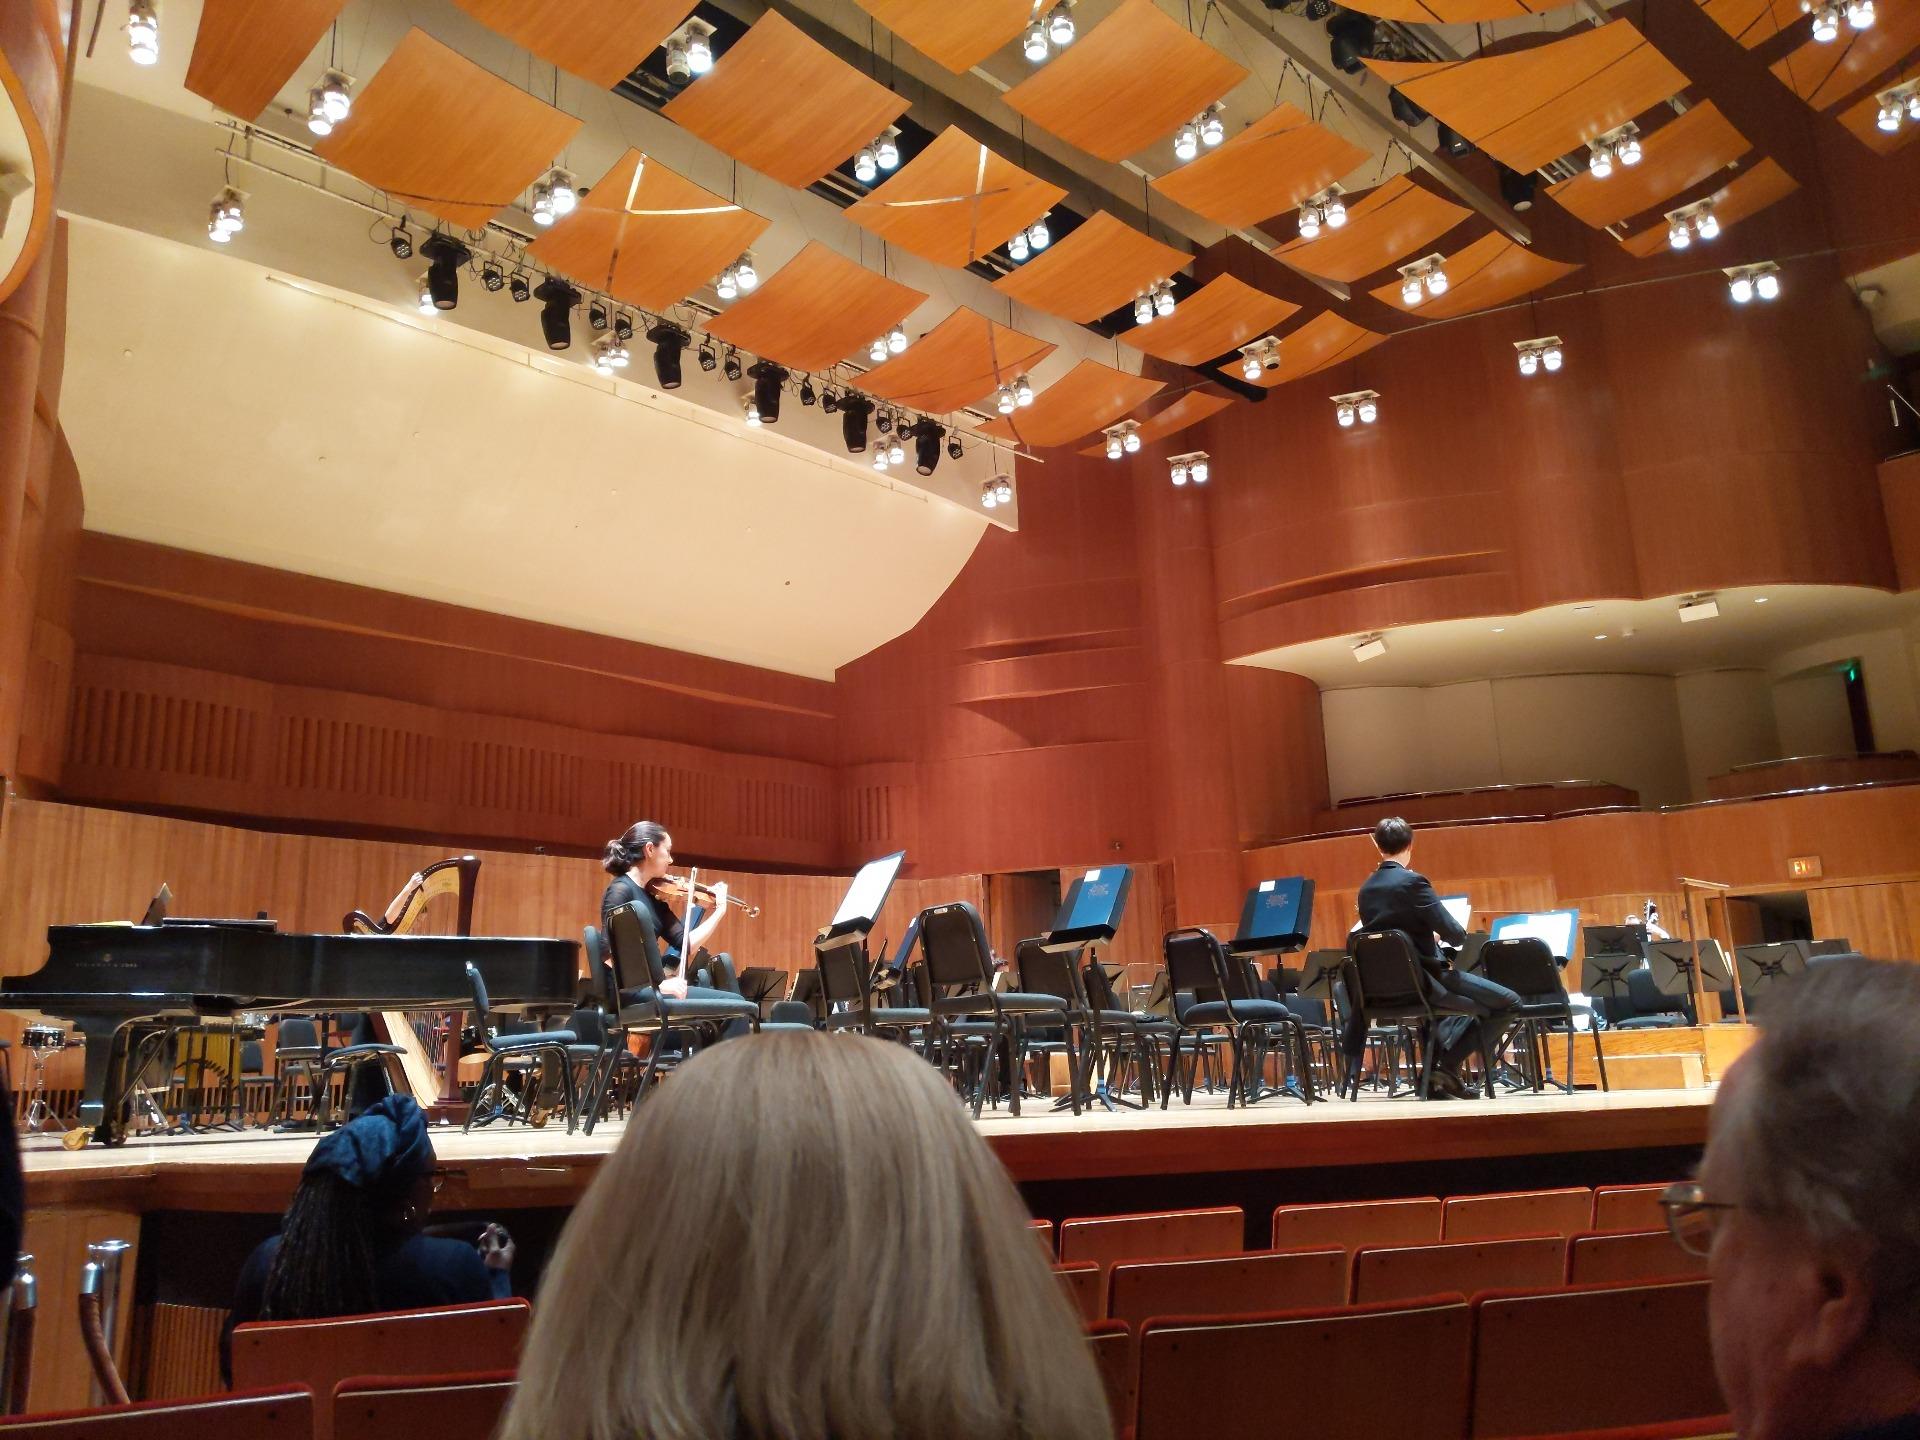 Joseph Meyerhoff Symphony Hall Section Orch Row G Seat 19